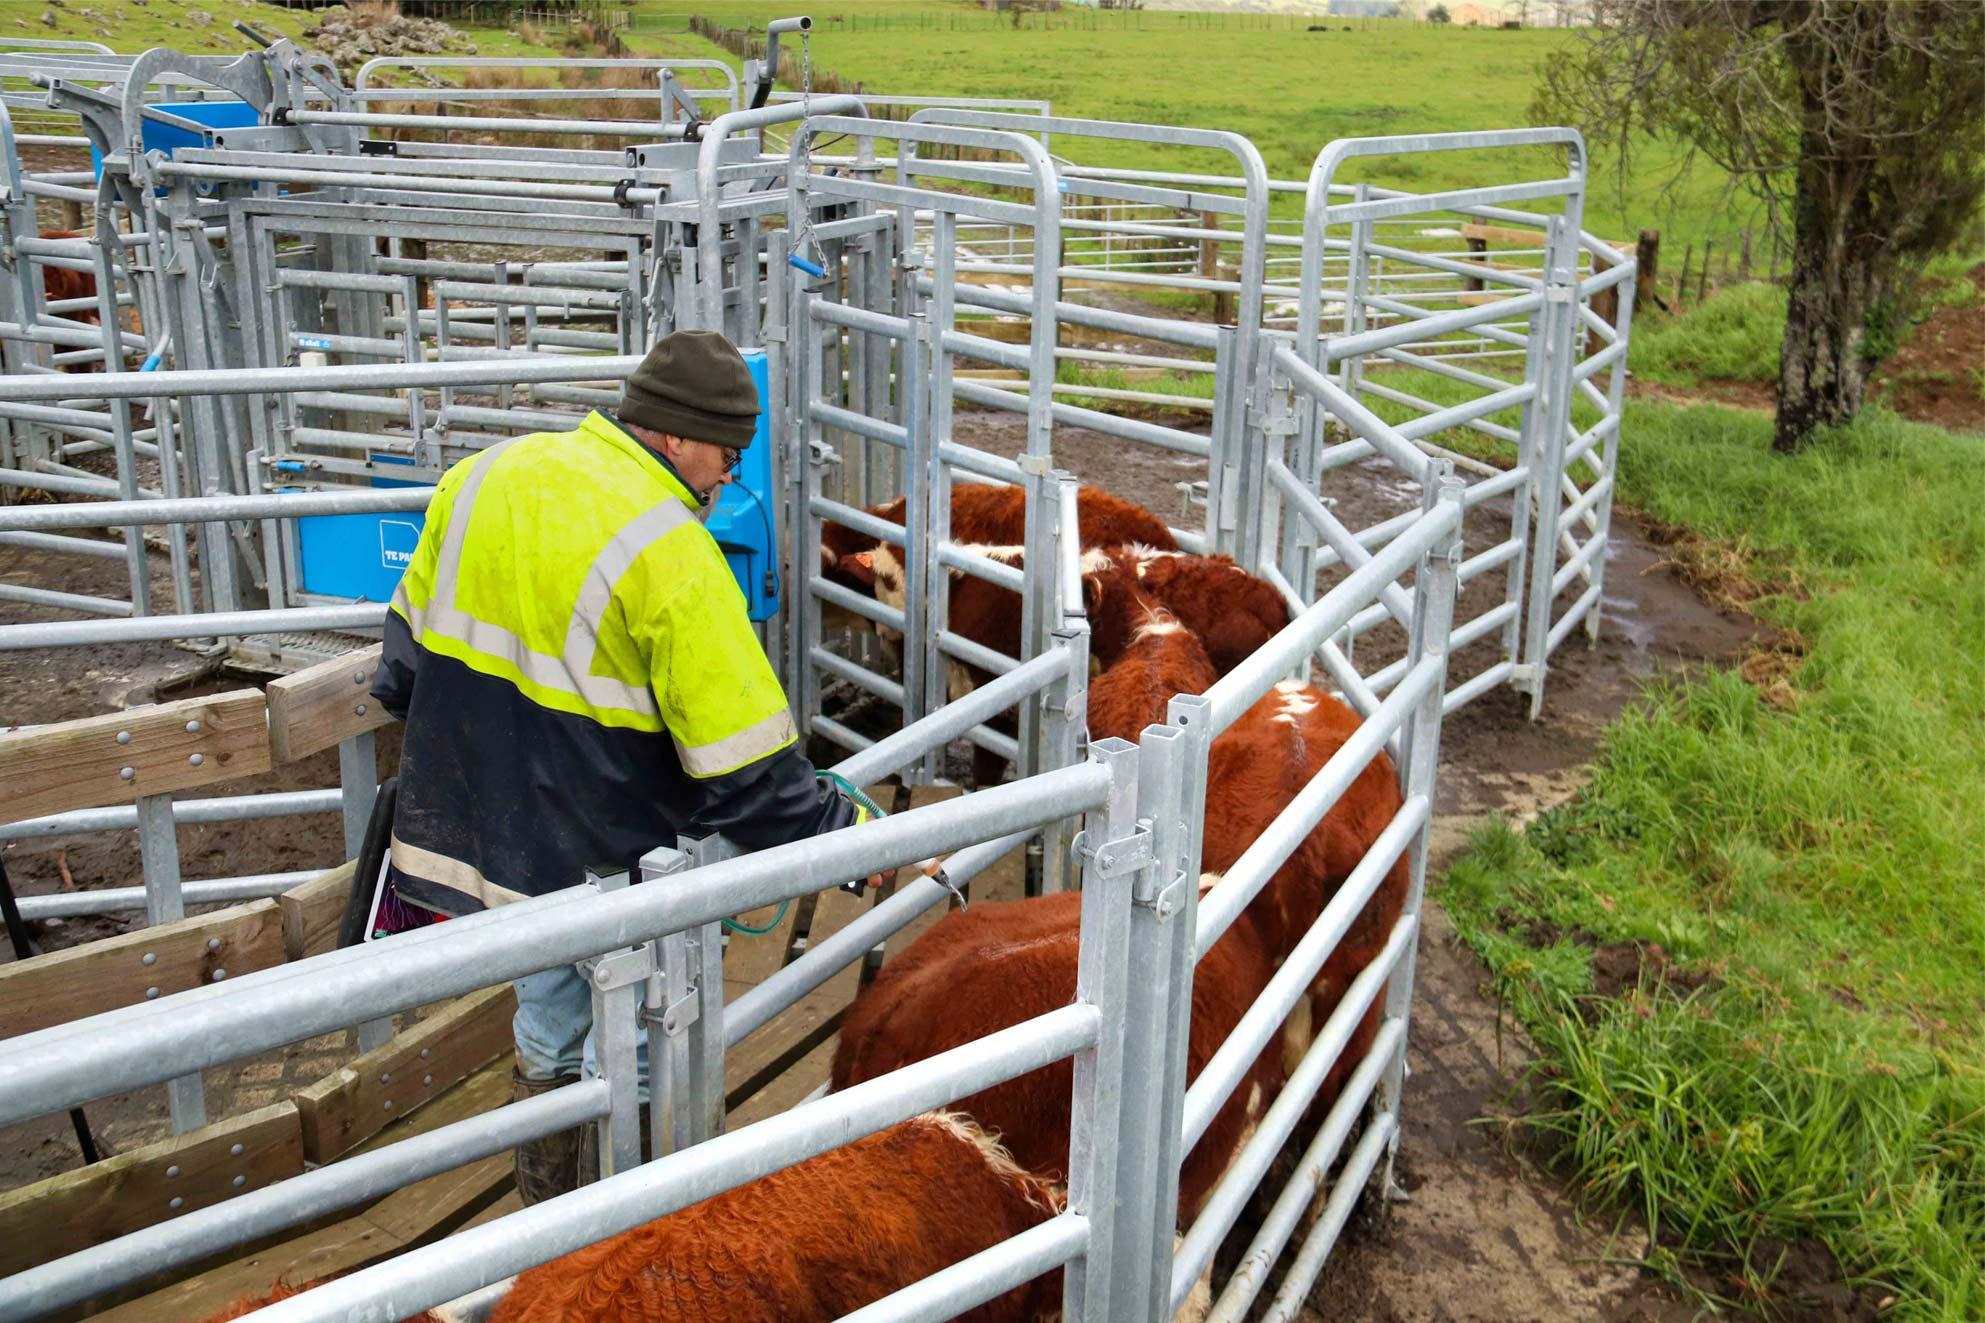 ian webb steel cattle yards nz, build plans hereford cattle breeders (4)